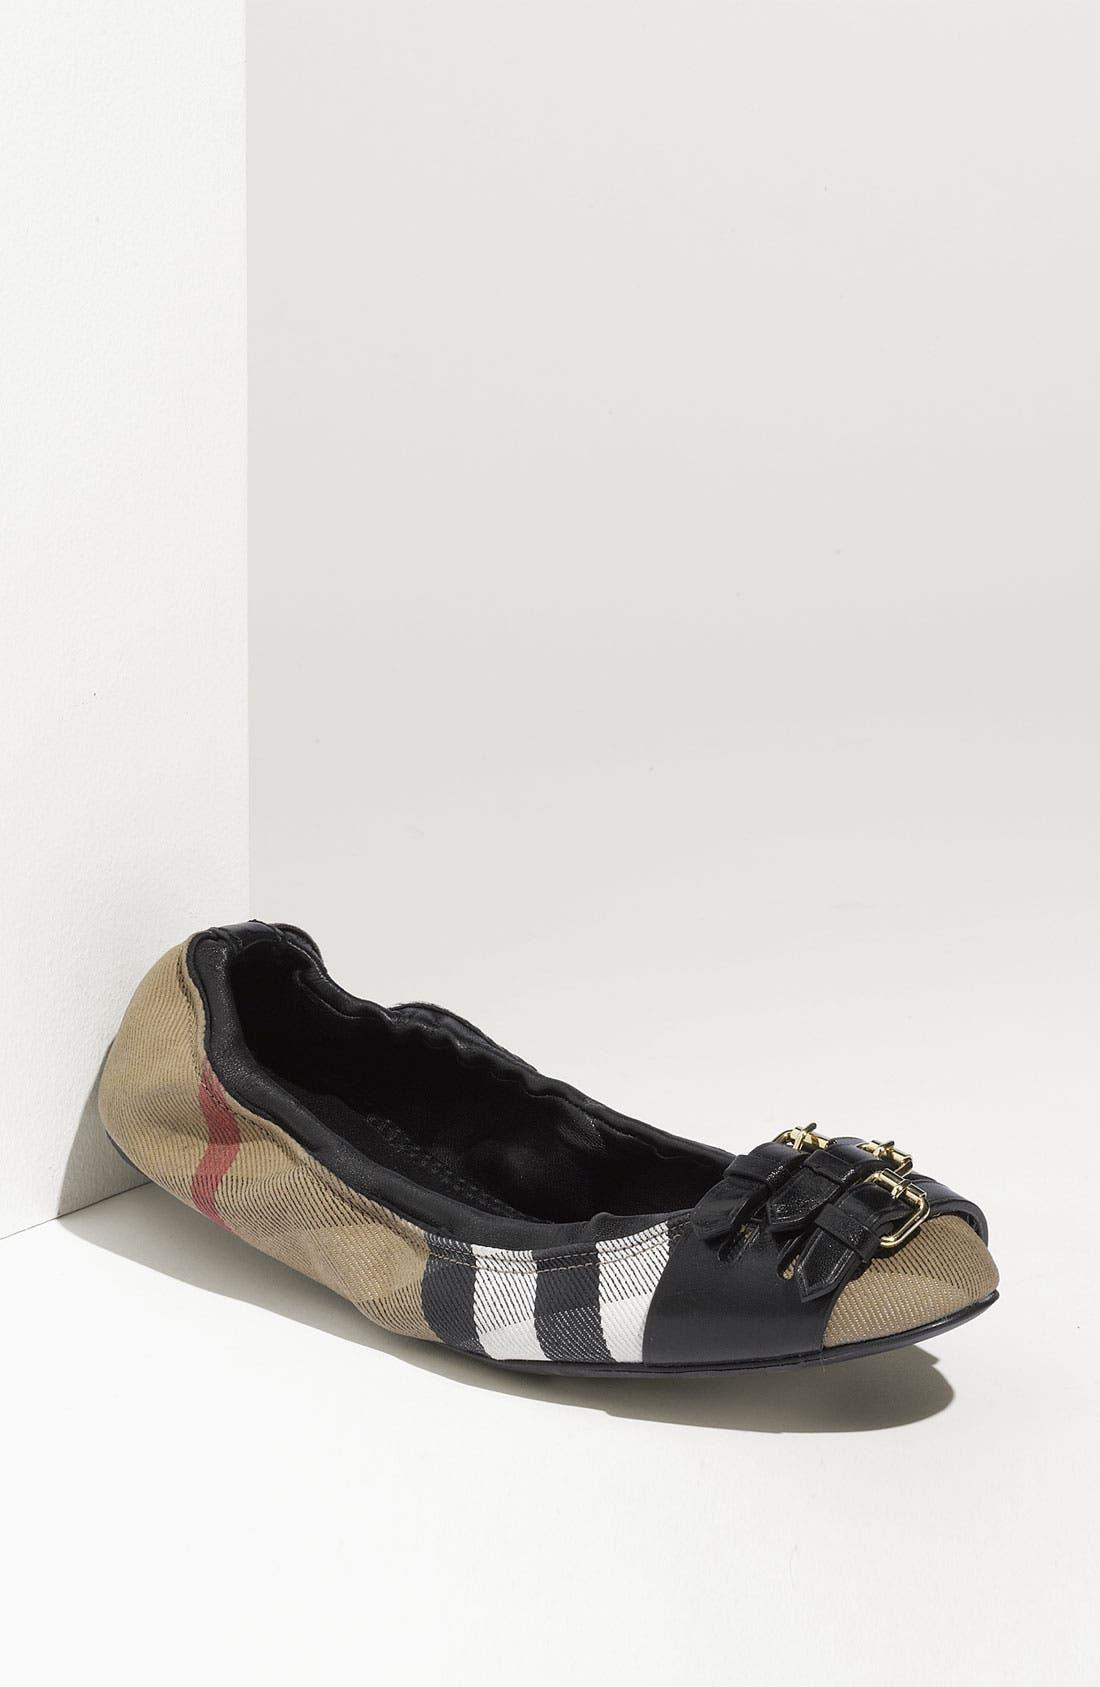 Main Image - Burberry Ballet Flat